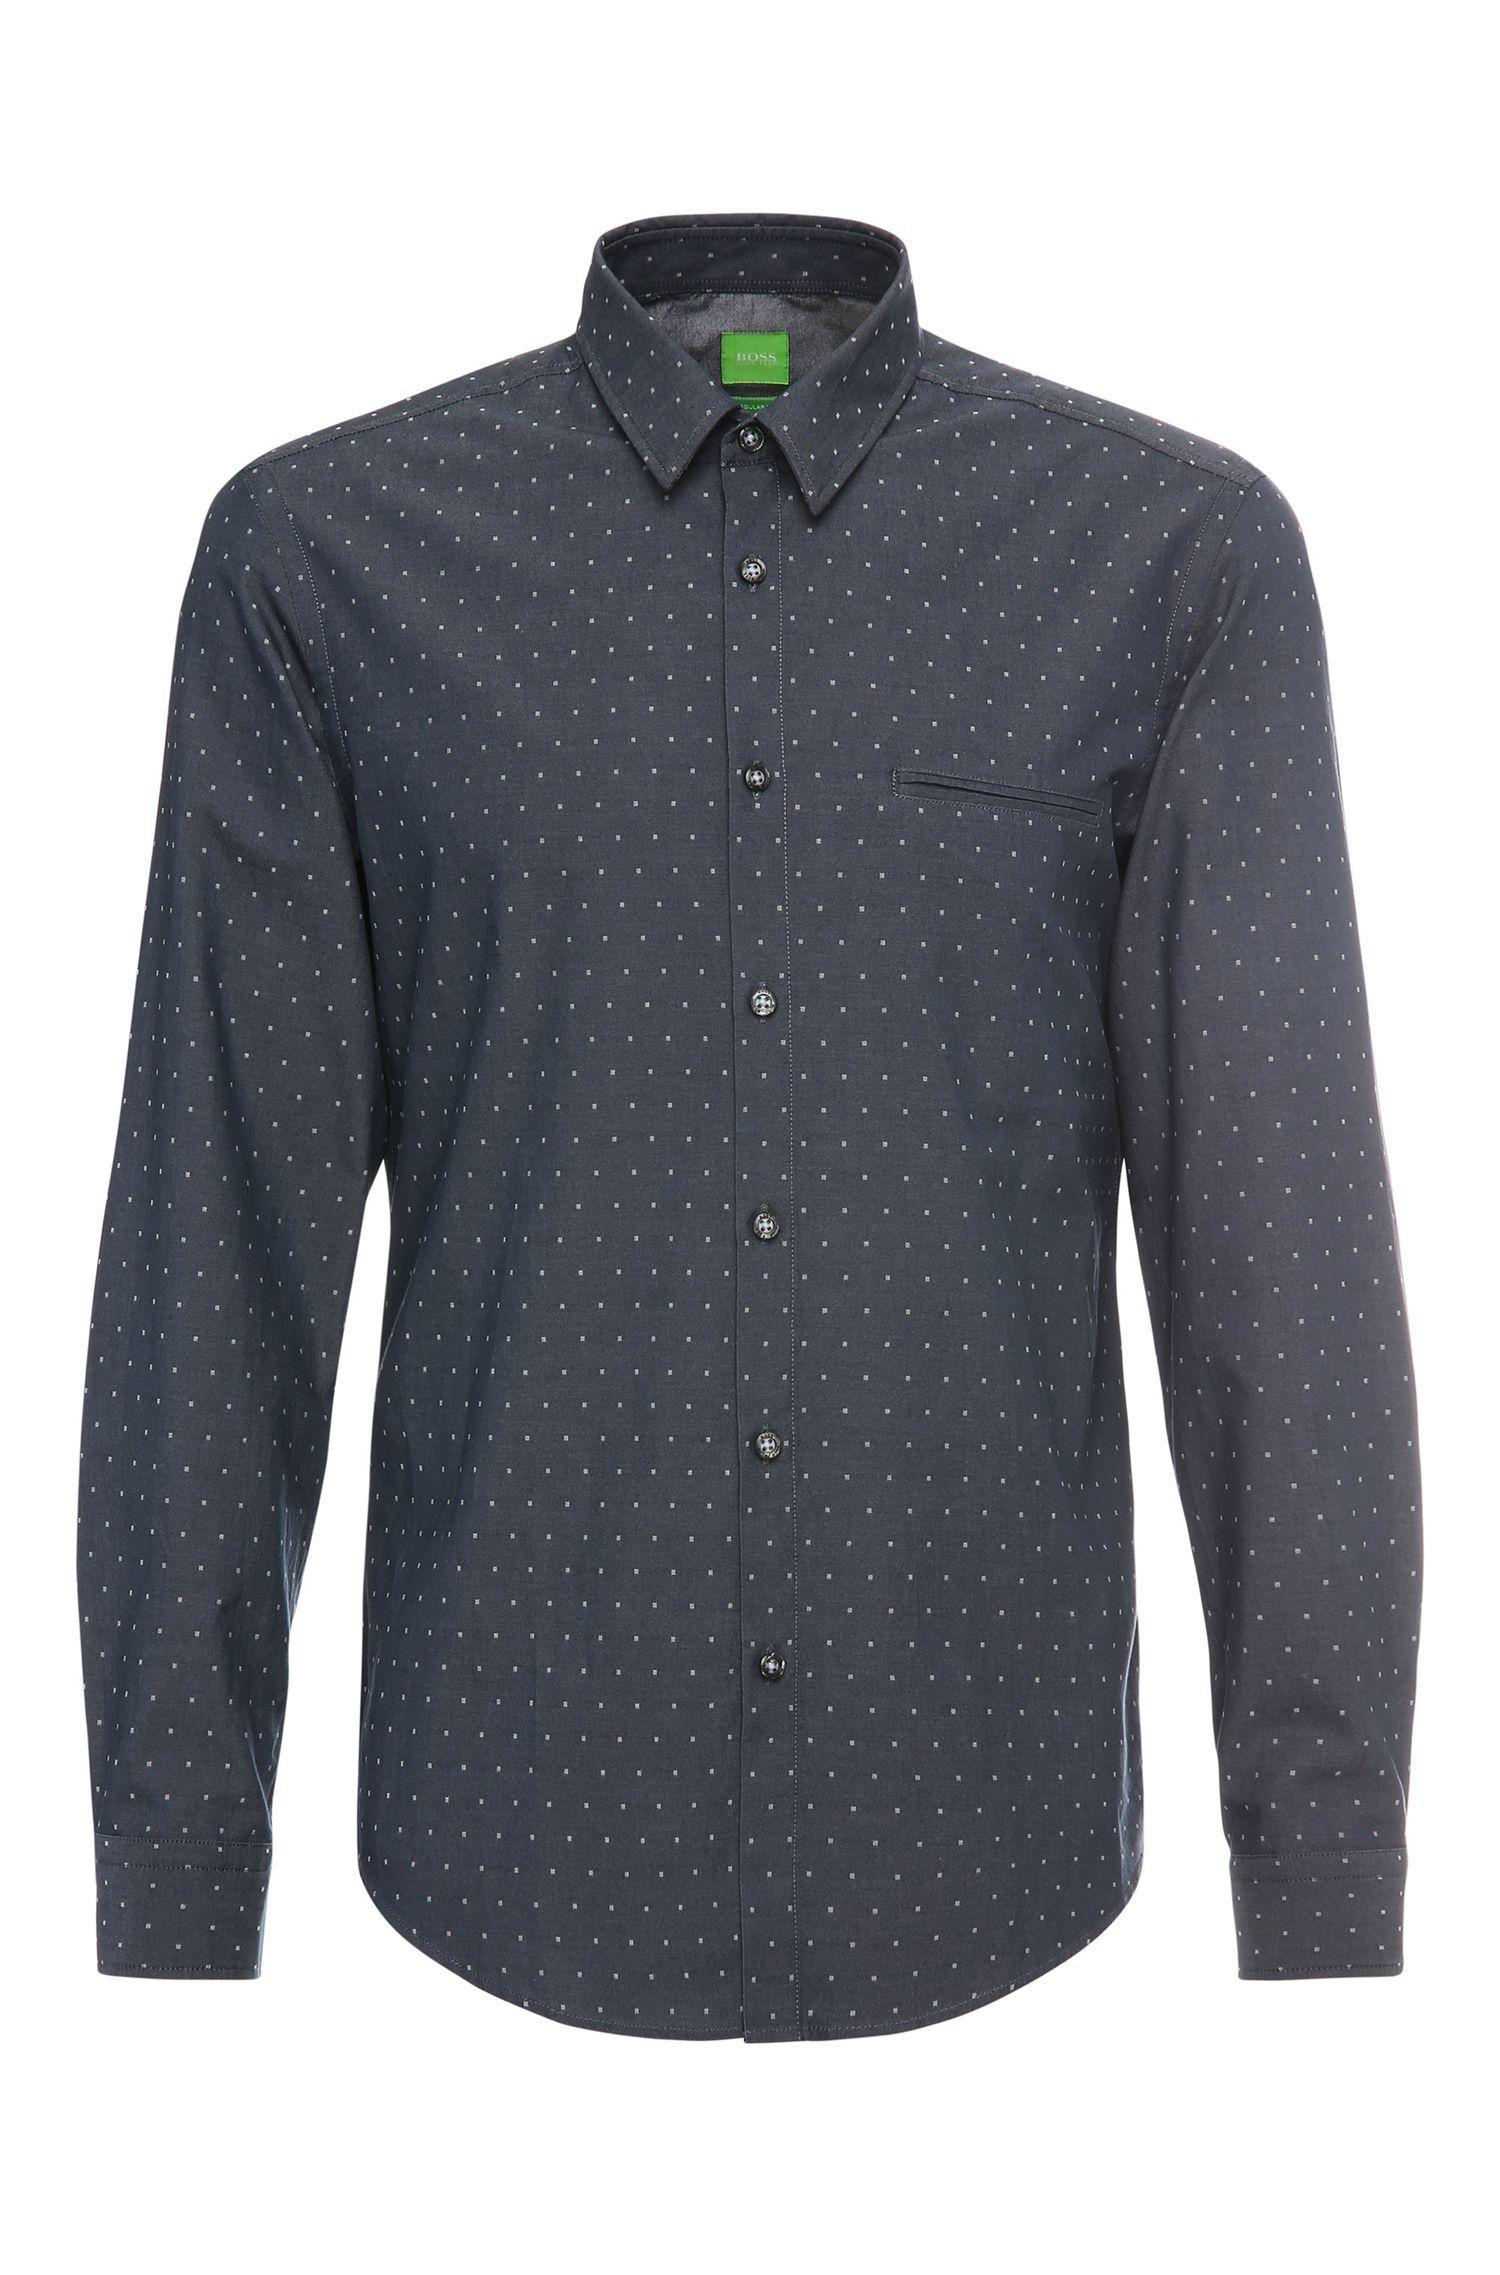 Cotton Dot Button Down Shirt, Regular Fit | C-Bacchis